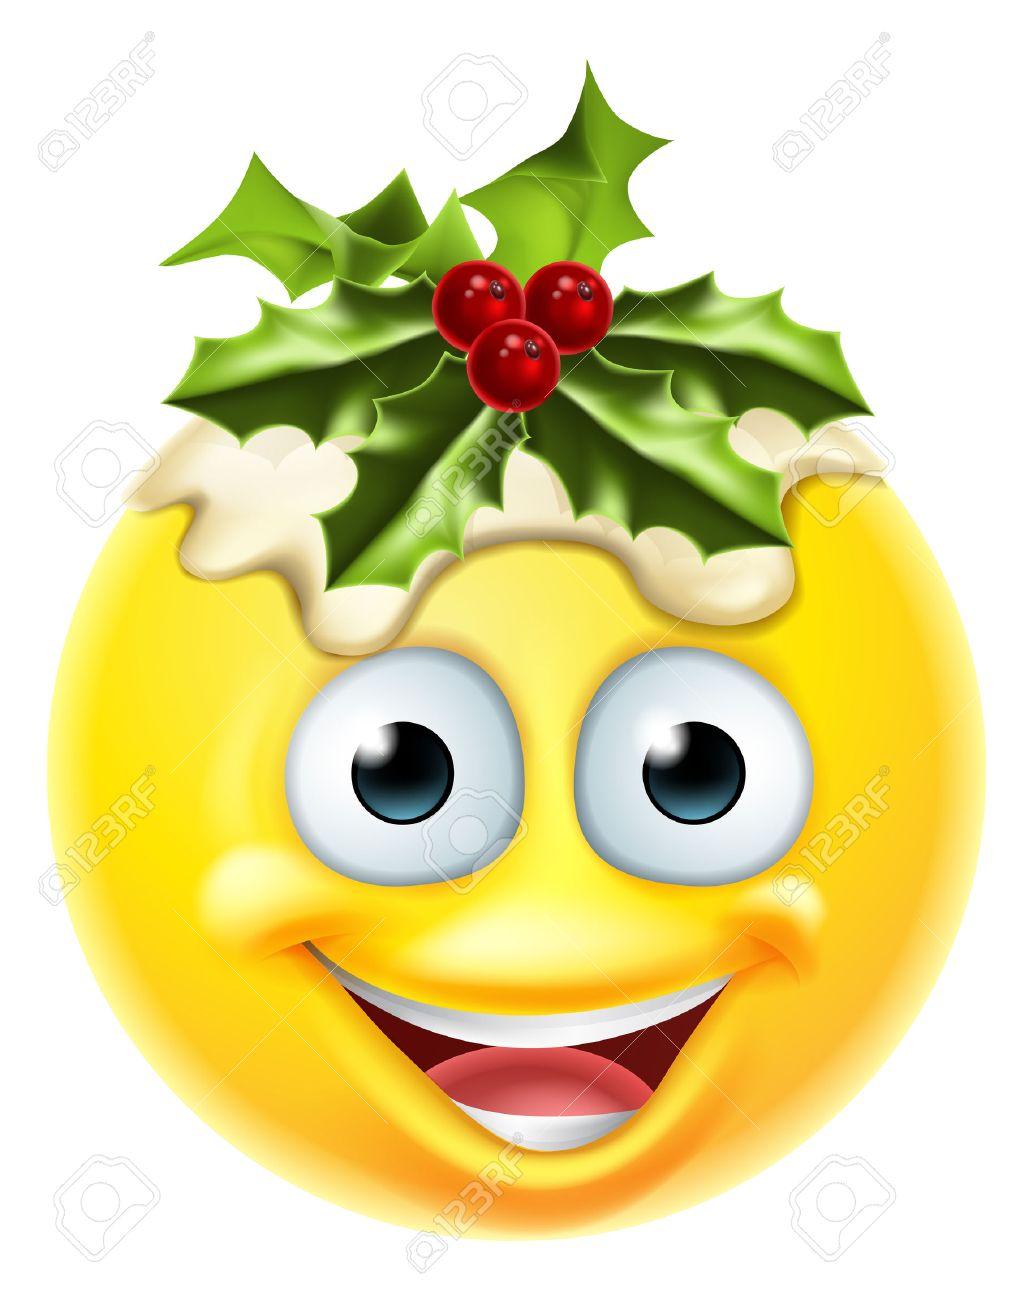 A Christmas pudding festive emoticon emoji character.